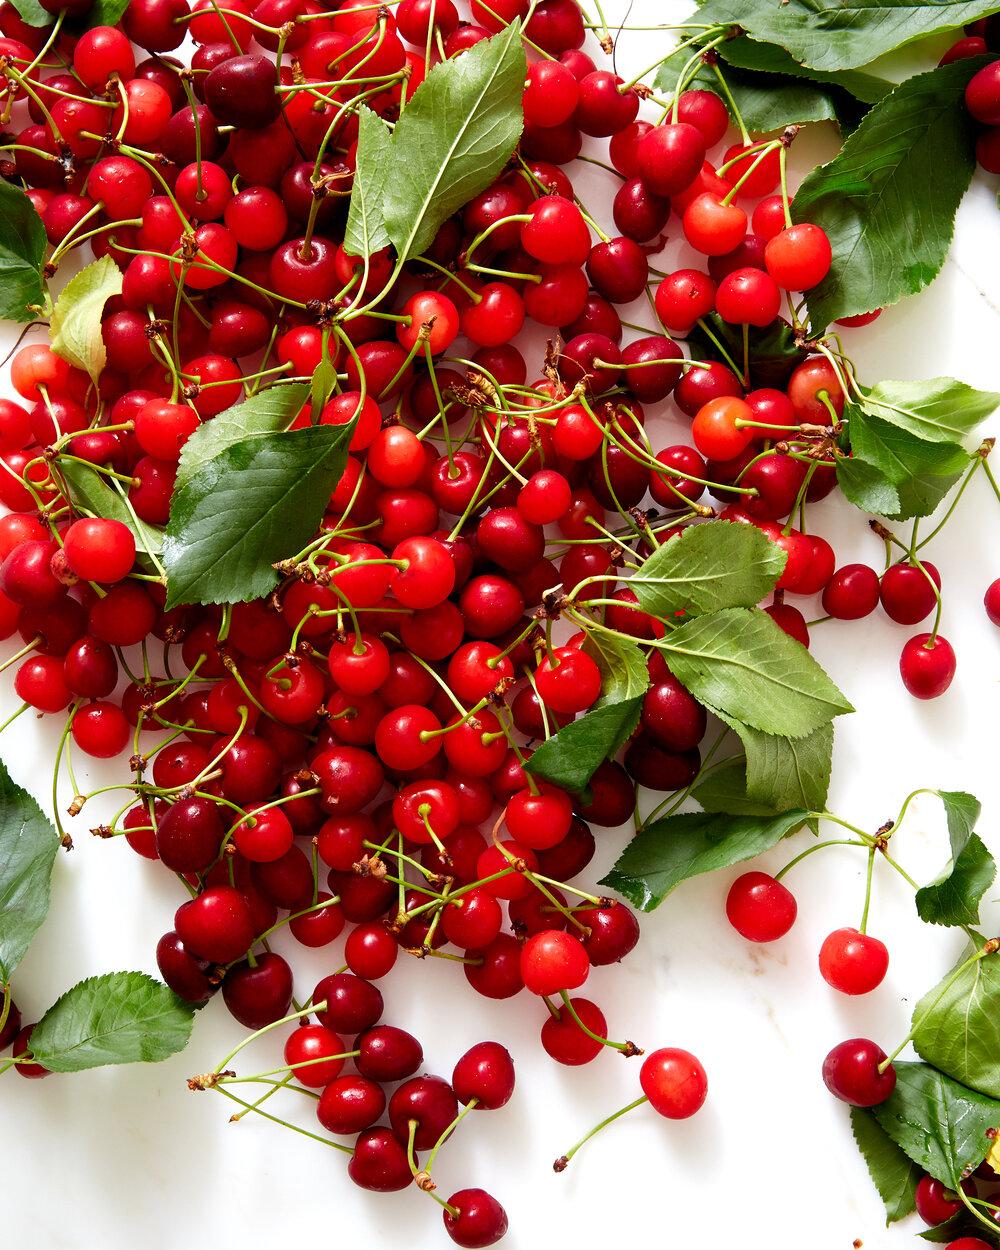 Cherries4134.jpg